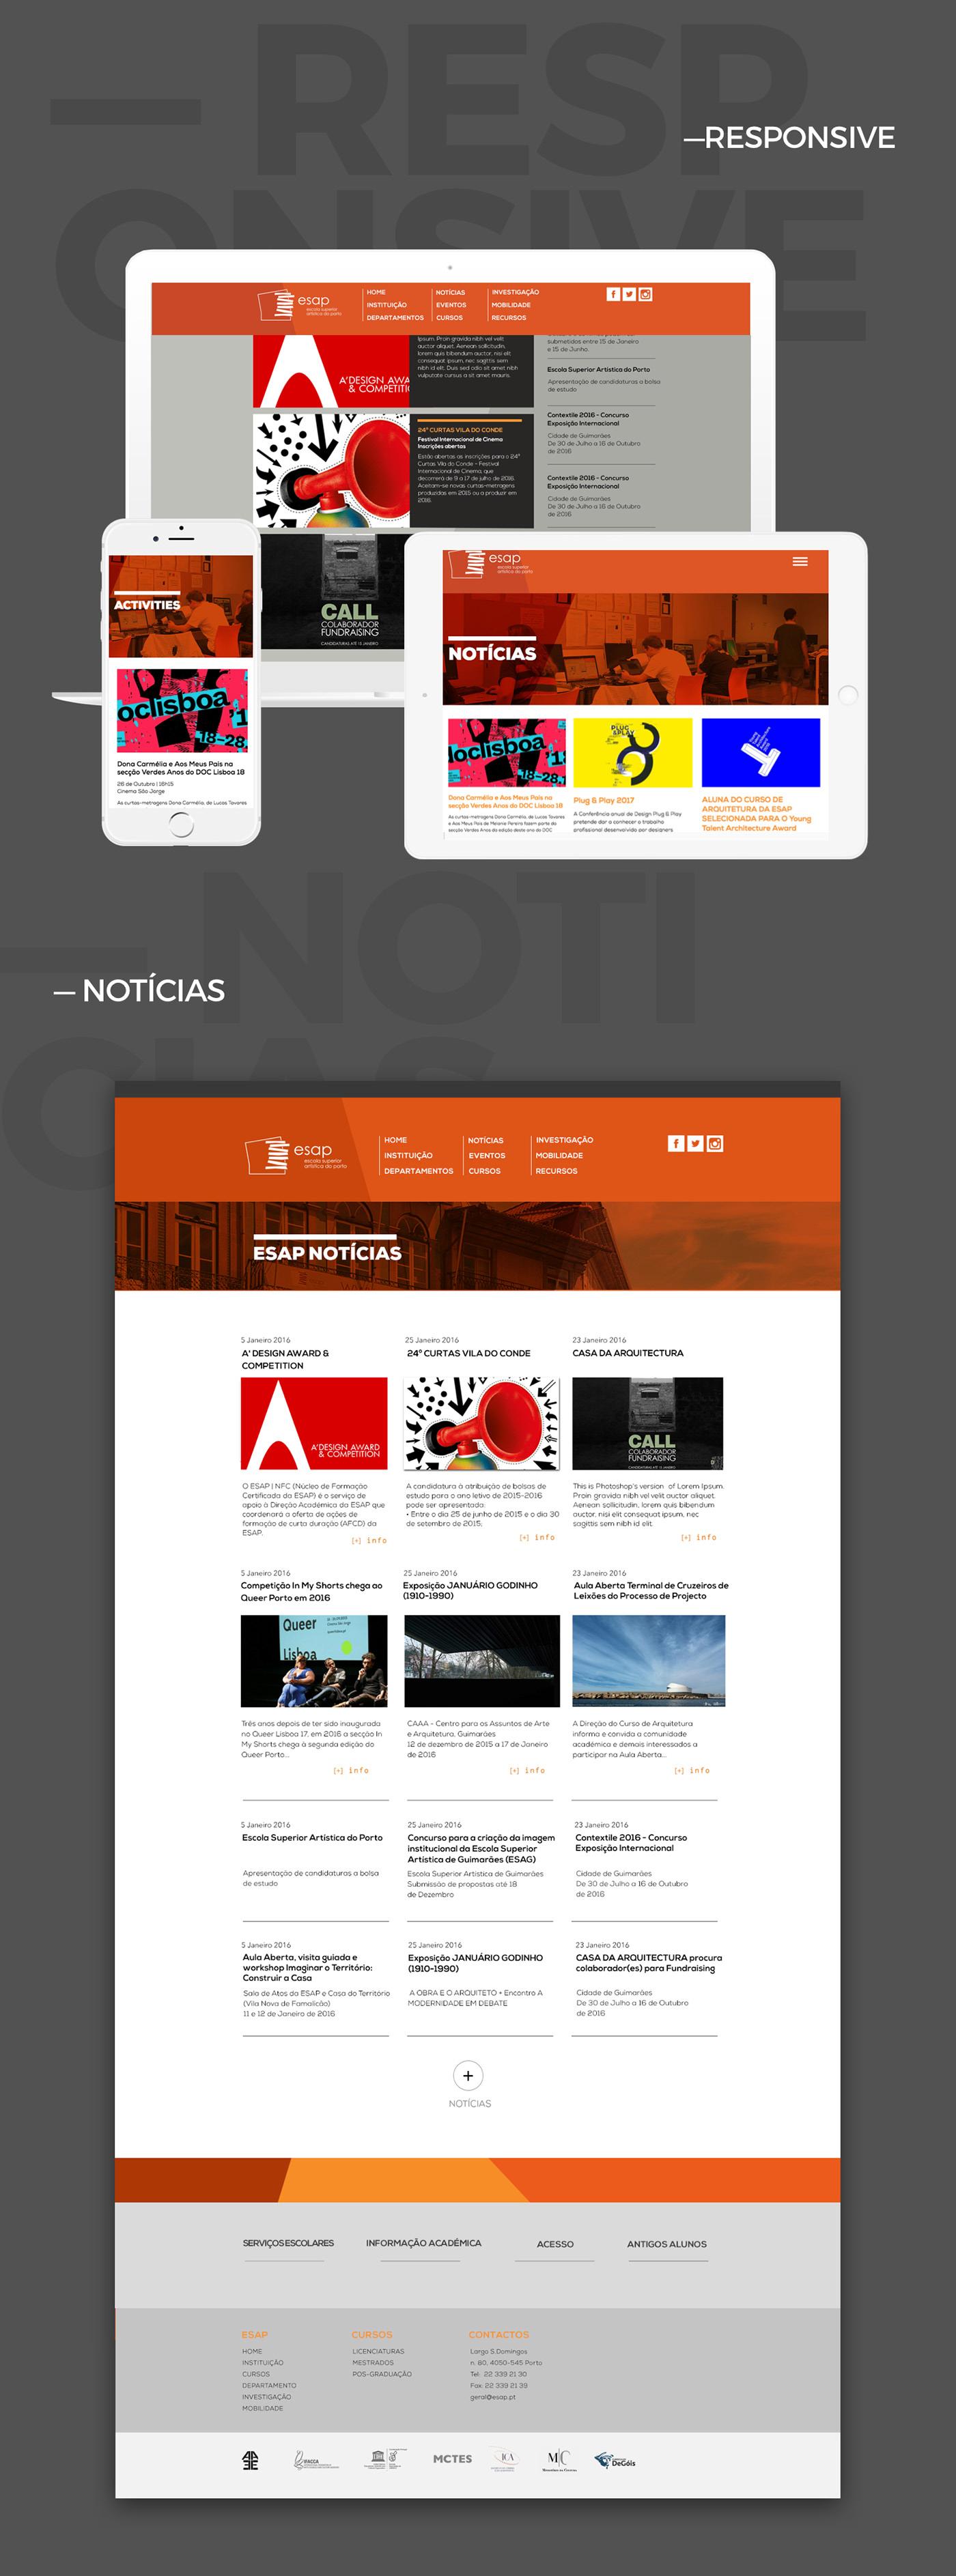 Web Website UI/UX design Interface